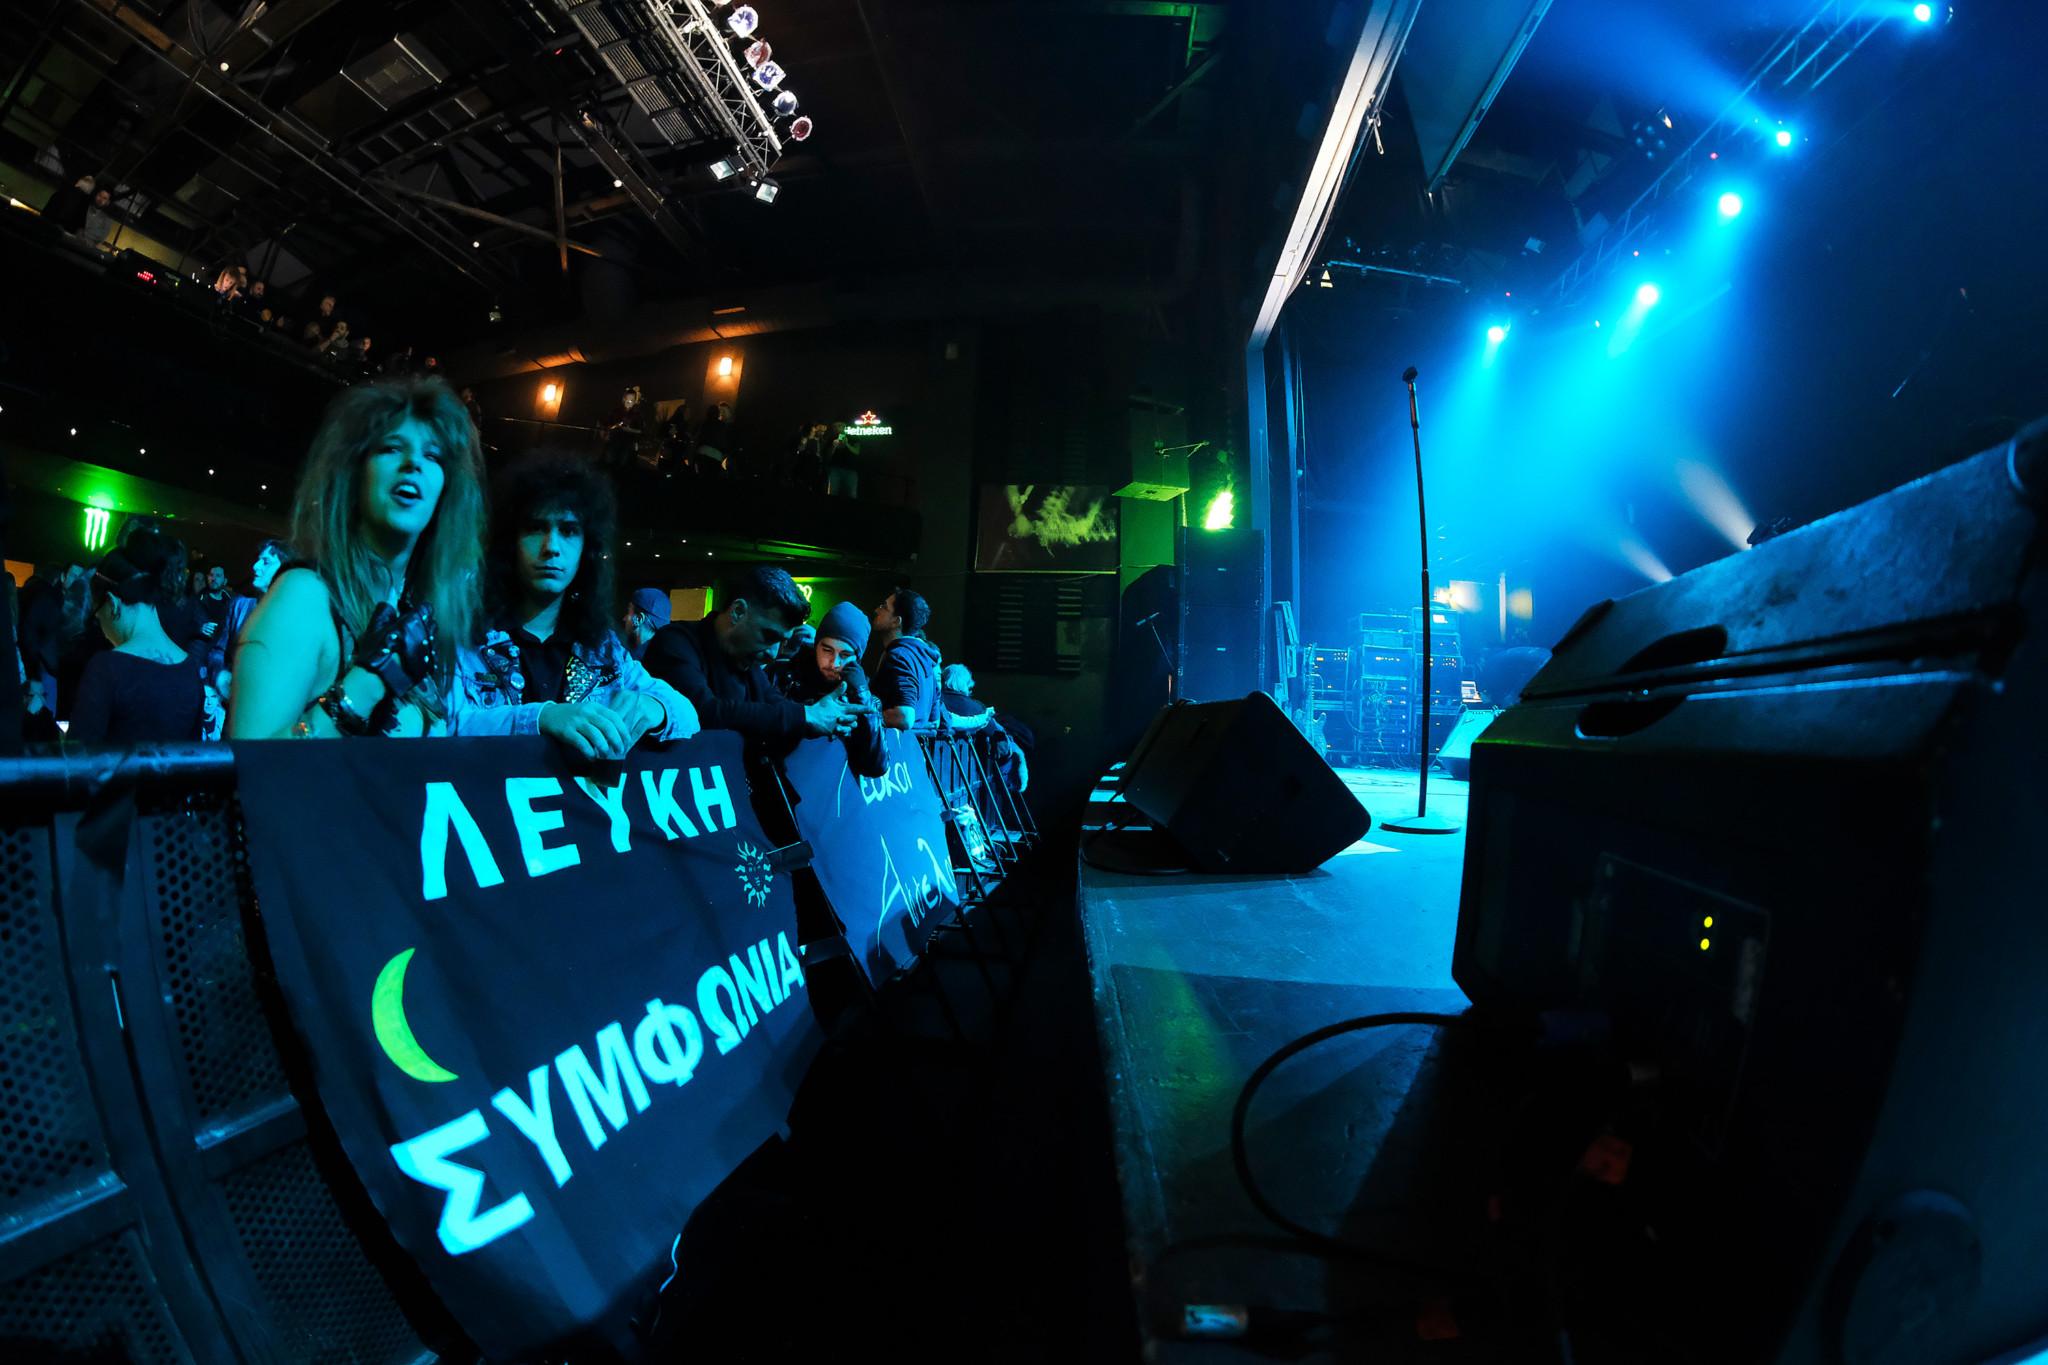 Lefki Symphonia Live At Gagarin 205 Athens 7.12.2018 photos by Miltos Kostoulas